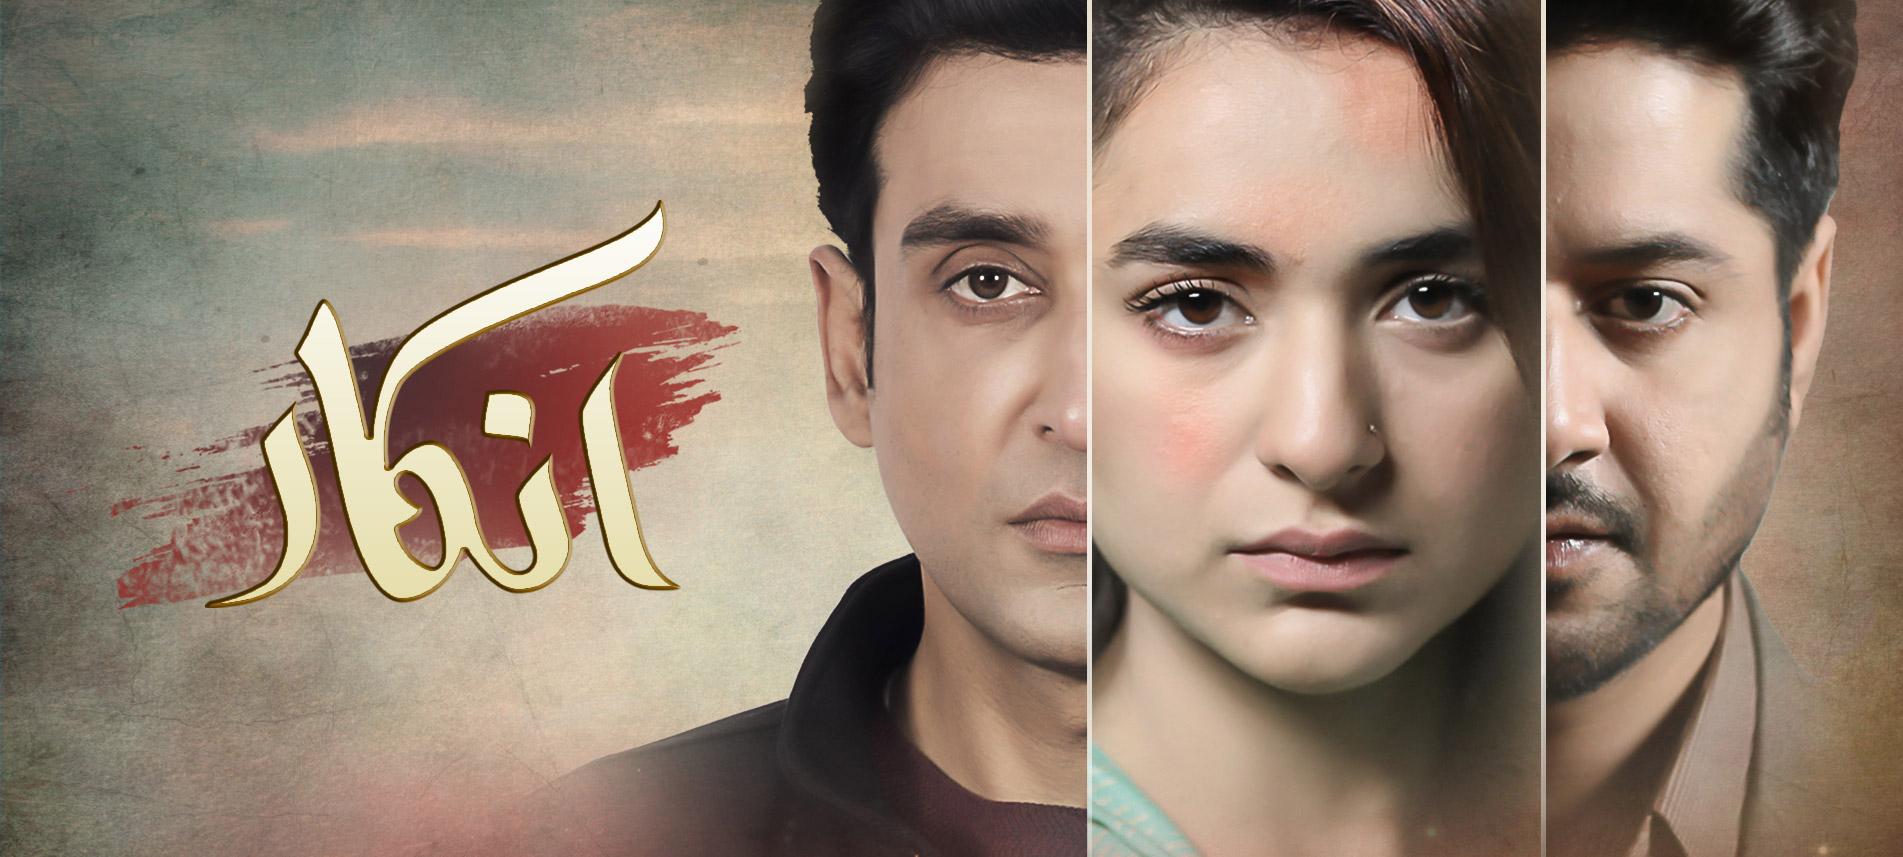 Inkaar: Imran Ashraf, Sami Khan and Yumna Zaid's Eyeopening Show About Consent